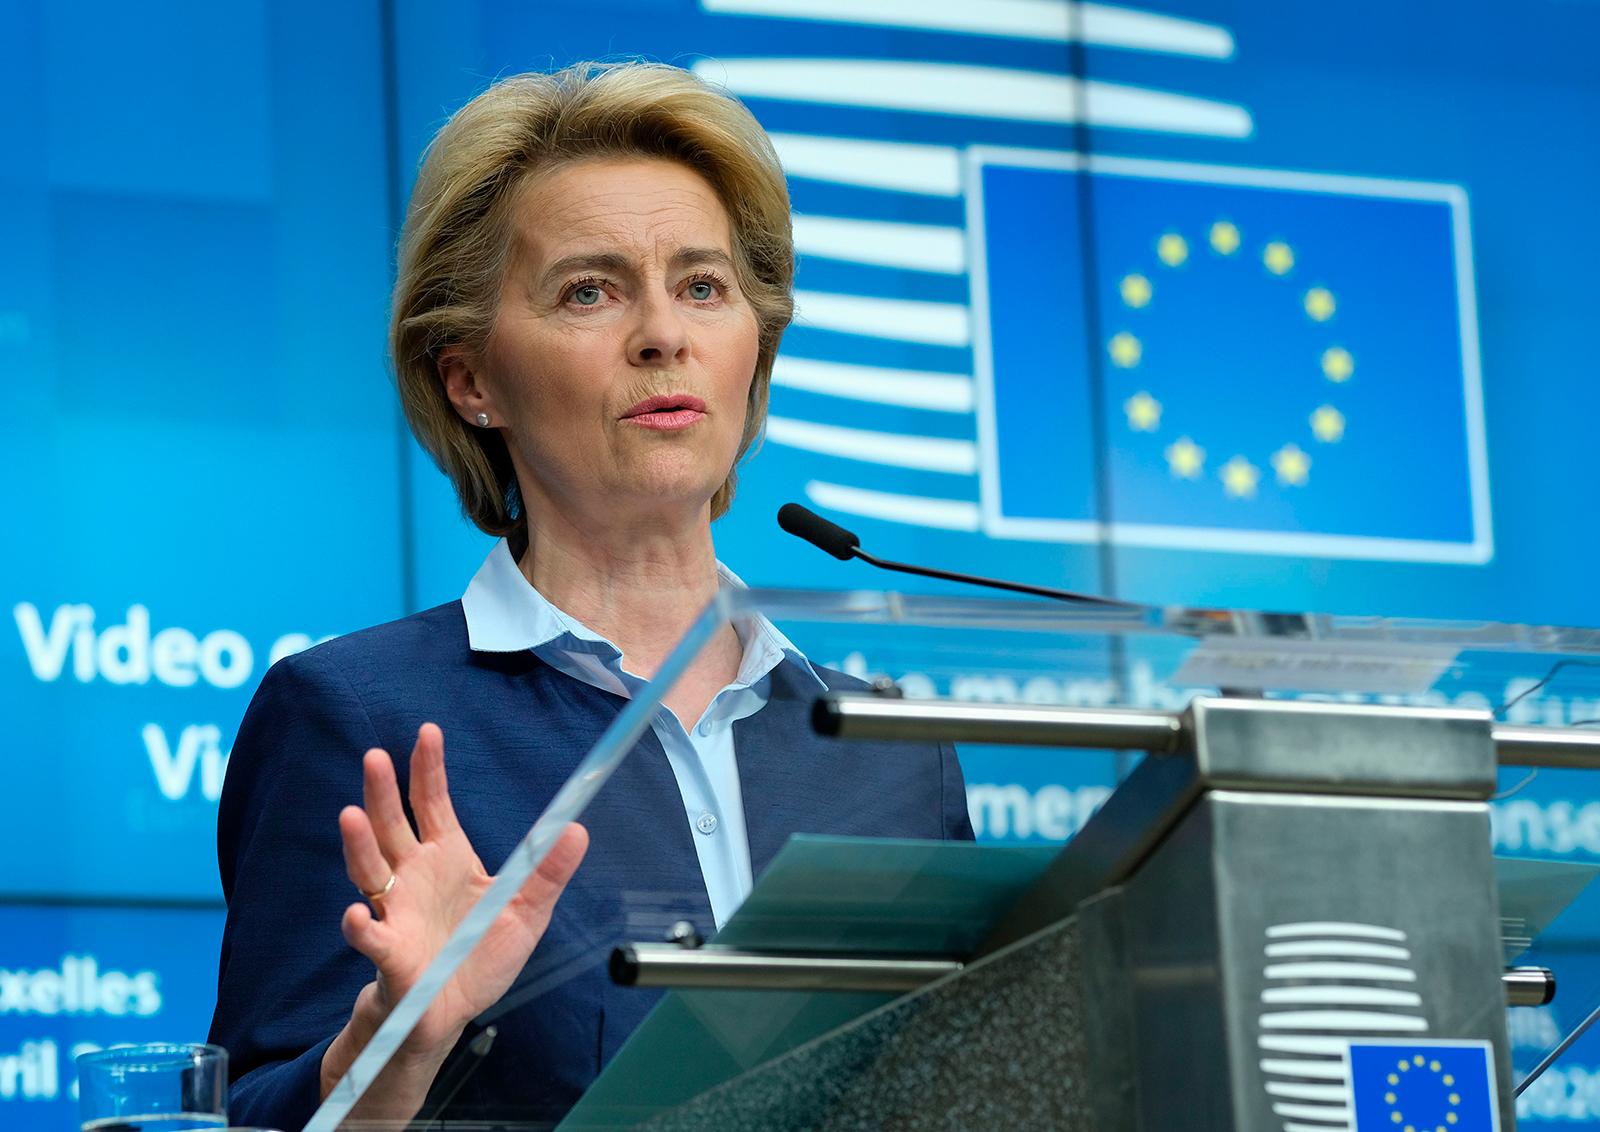 European Commission President Ursula Von Der Leyen gives a press conference in Brussels, on April 23.